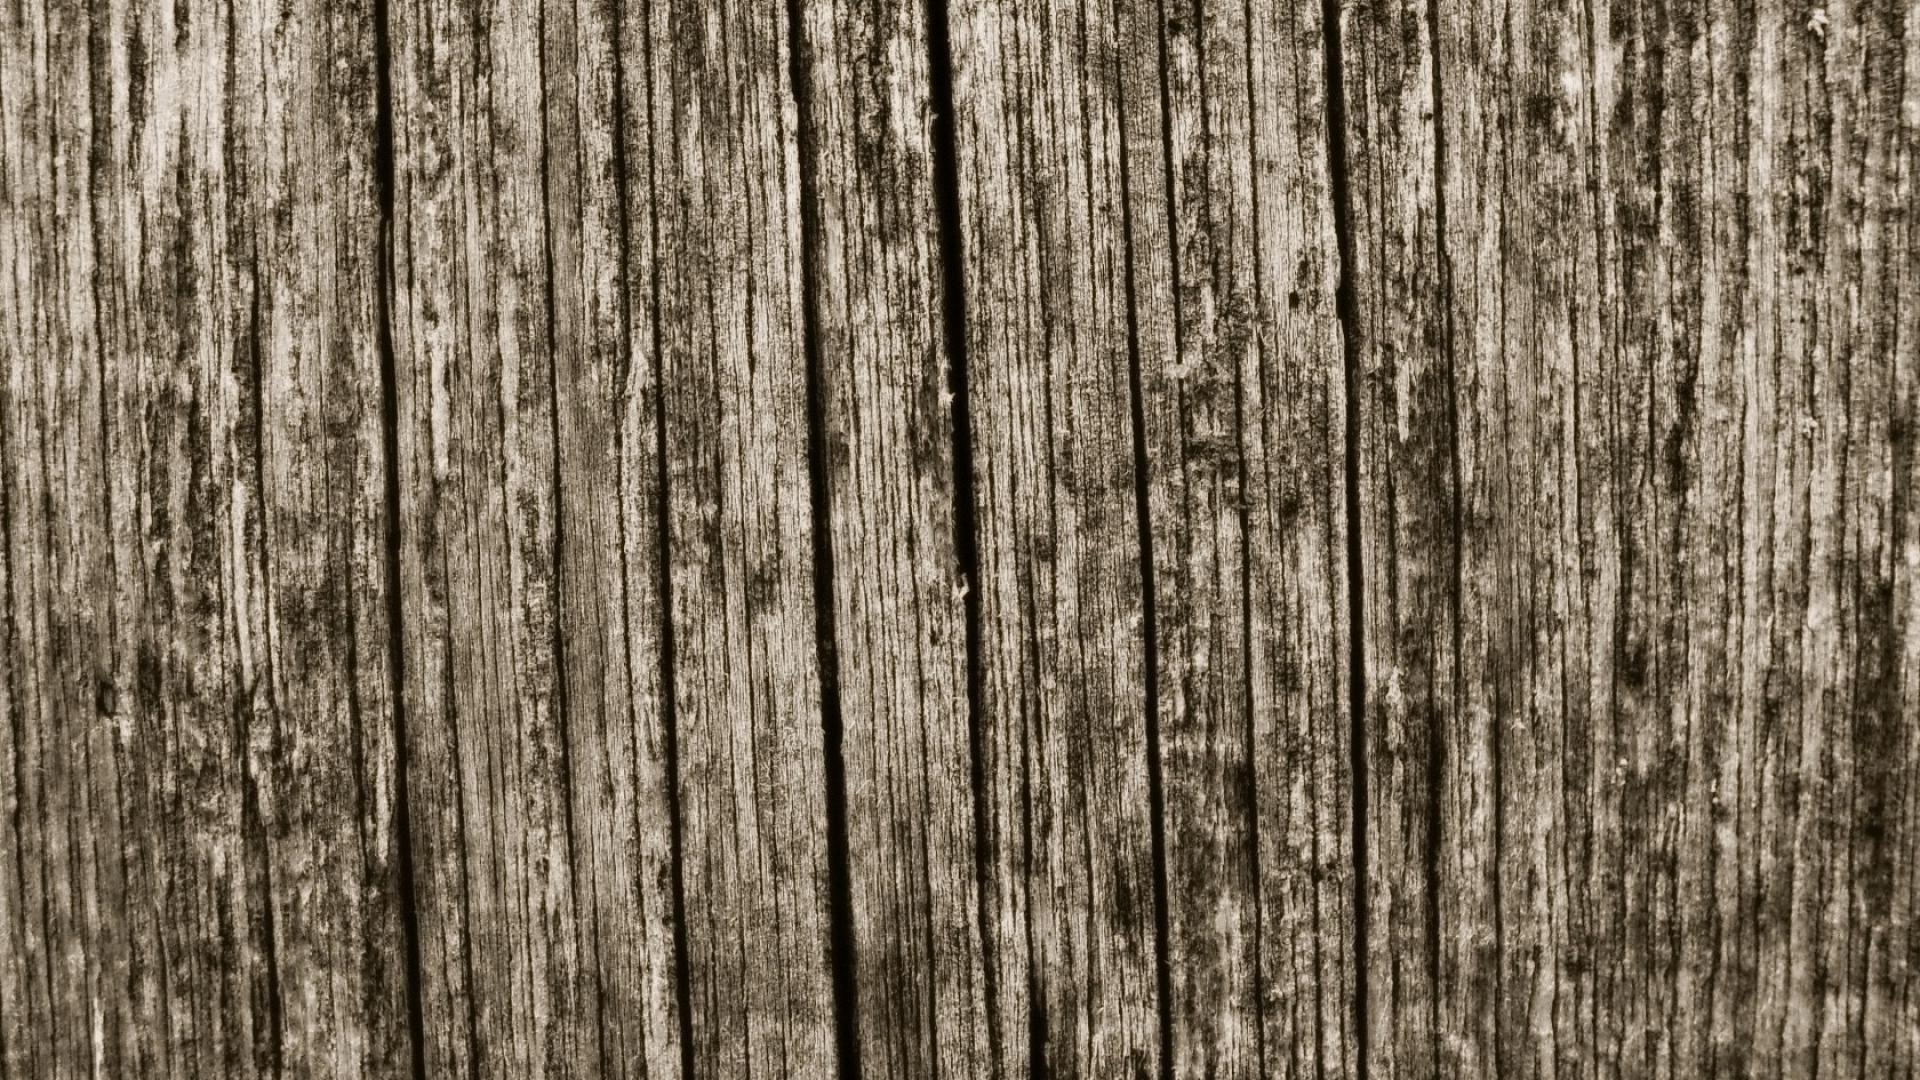 wood wallpaper images